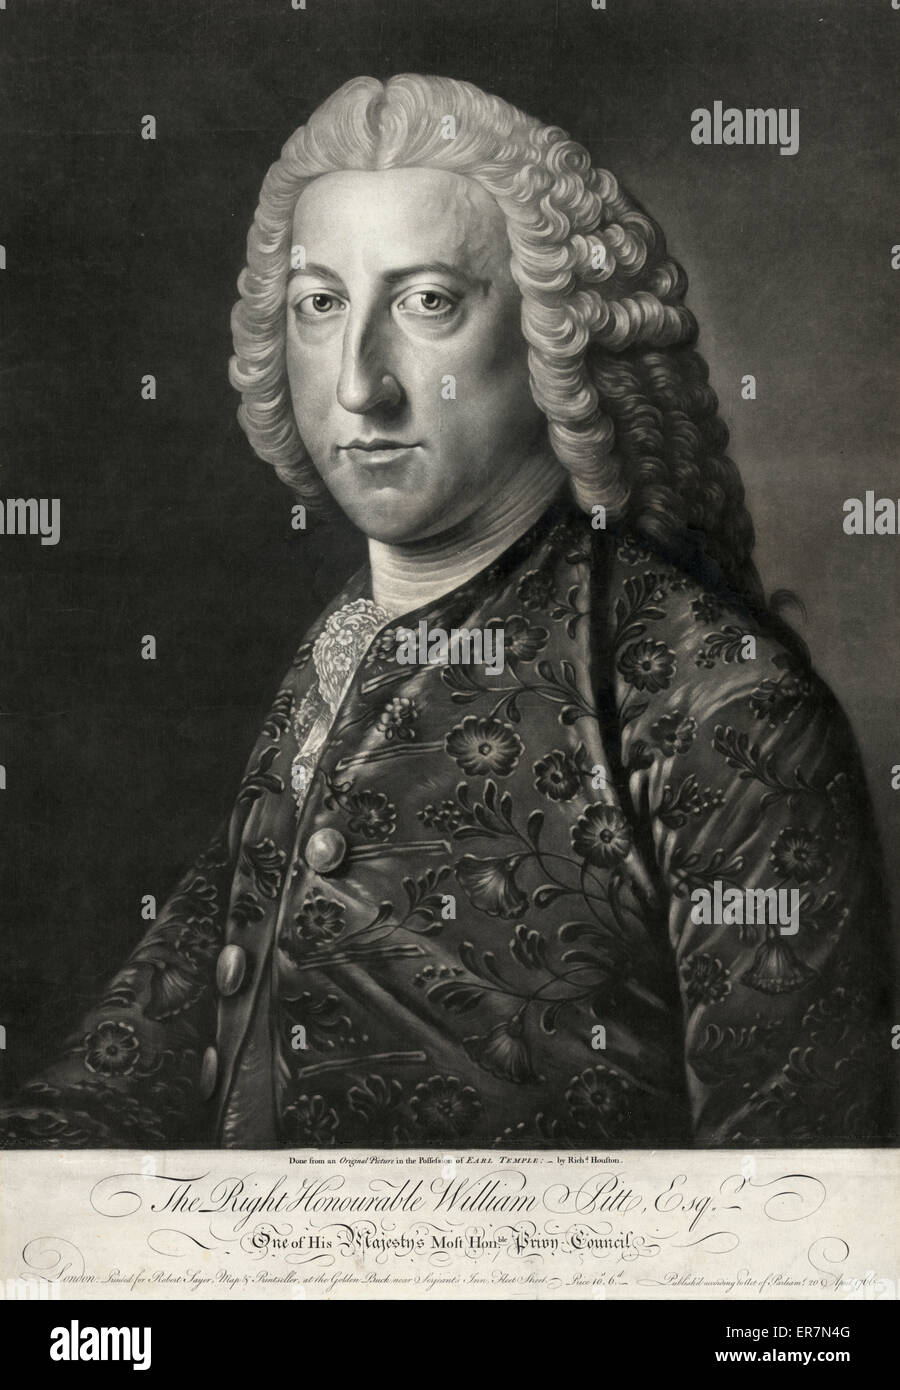 Le Très Honorable William Pitt, Esqr. Photo Stock